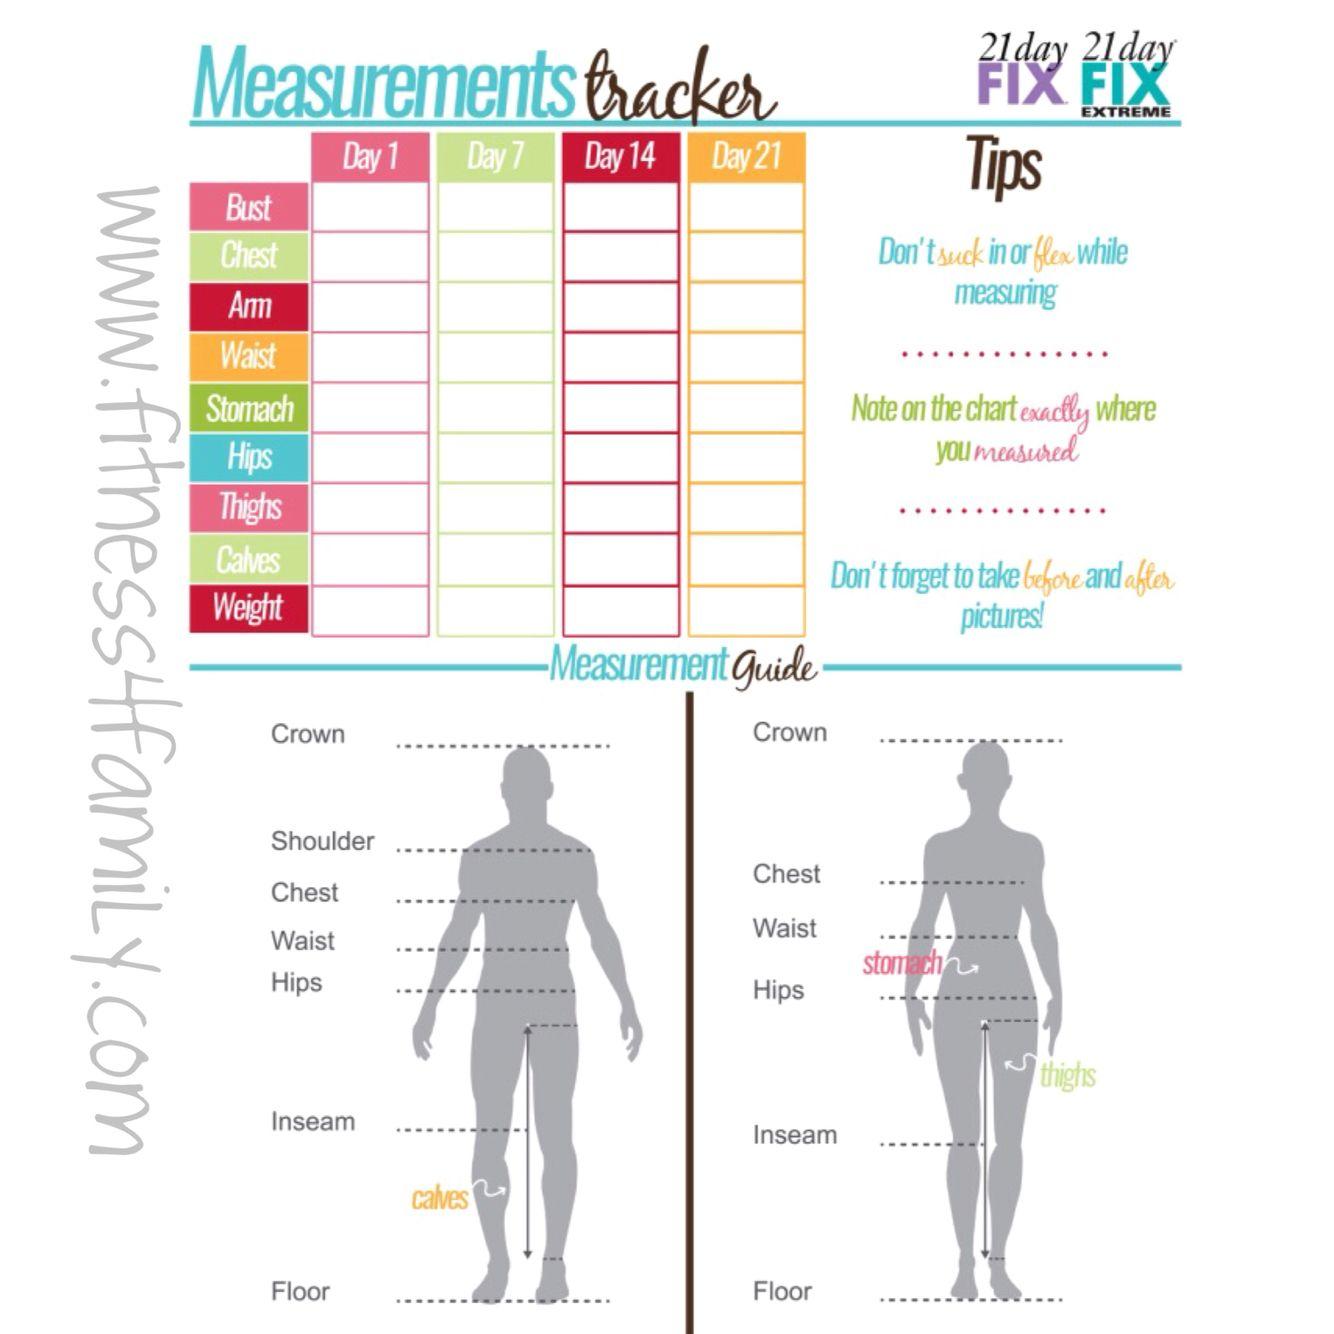 21 day fix body measurement tracker | 21 Day Fix | Pinterest ...